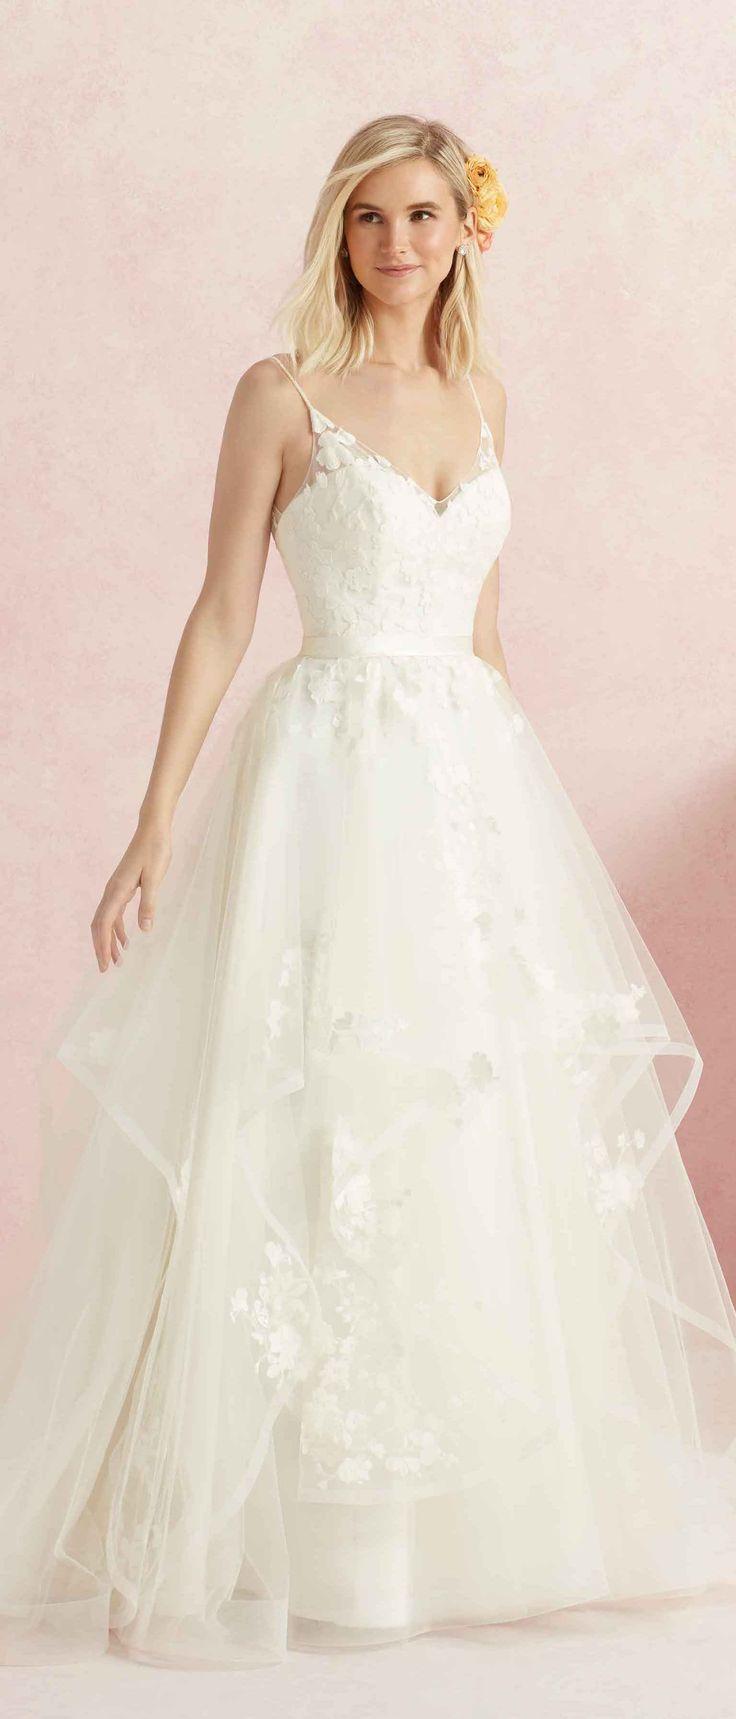 Wedding Dress from Beloved by Casablanca Bridal | Spring 2017 Awaken Collection